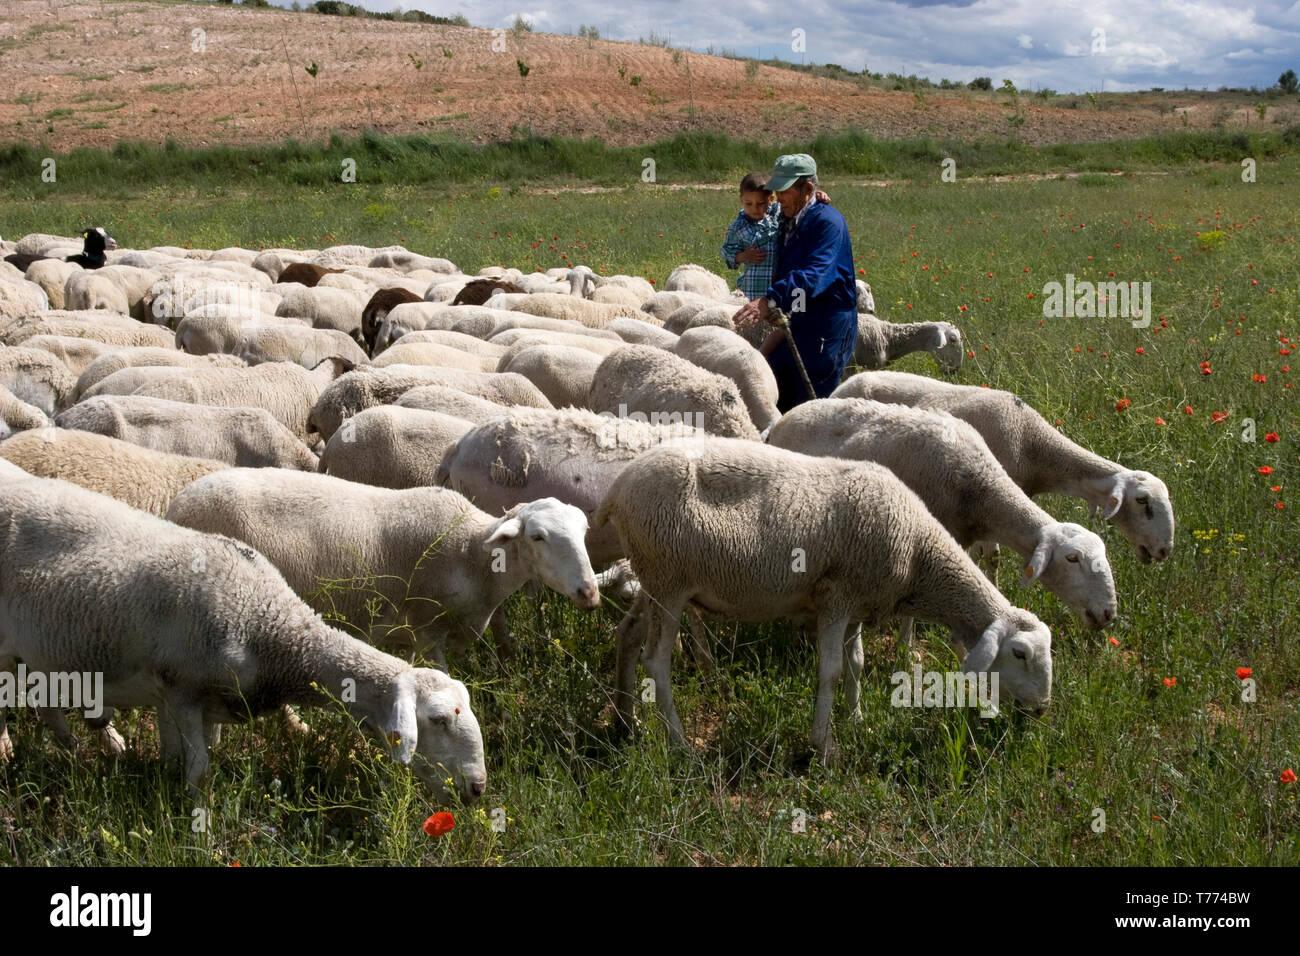 spanish shepherd with little boy tending the flock - Stock Image